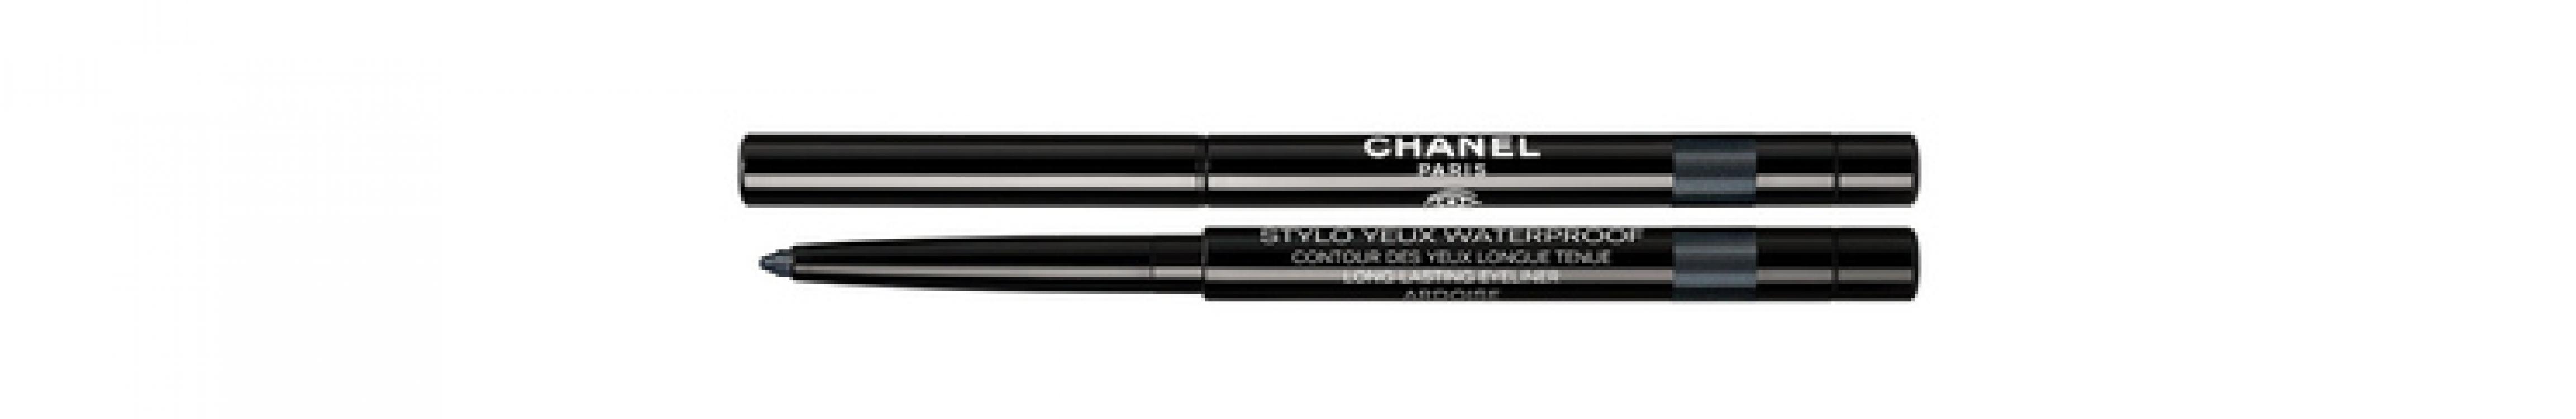 Водостойкий карандаш Stylo Yeux Waterproof, оттенок Ardoise, из коллекции R?verie Parisienne, Chanel